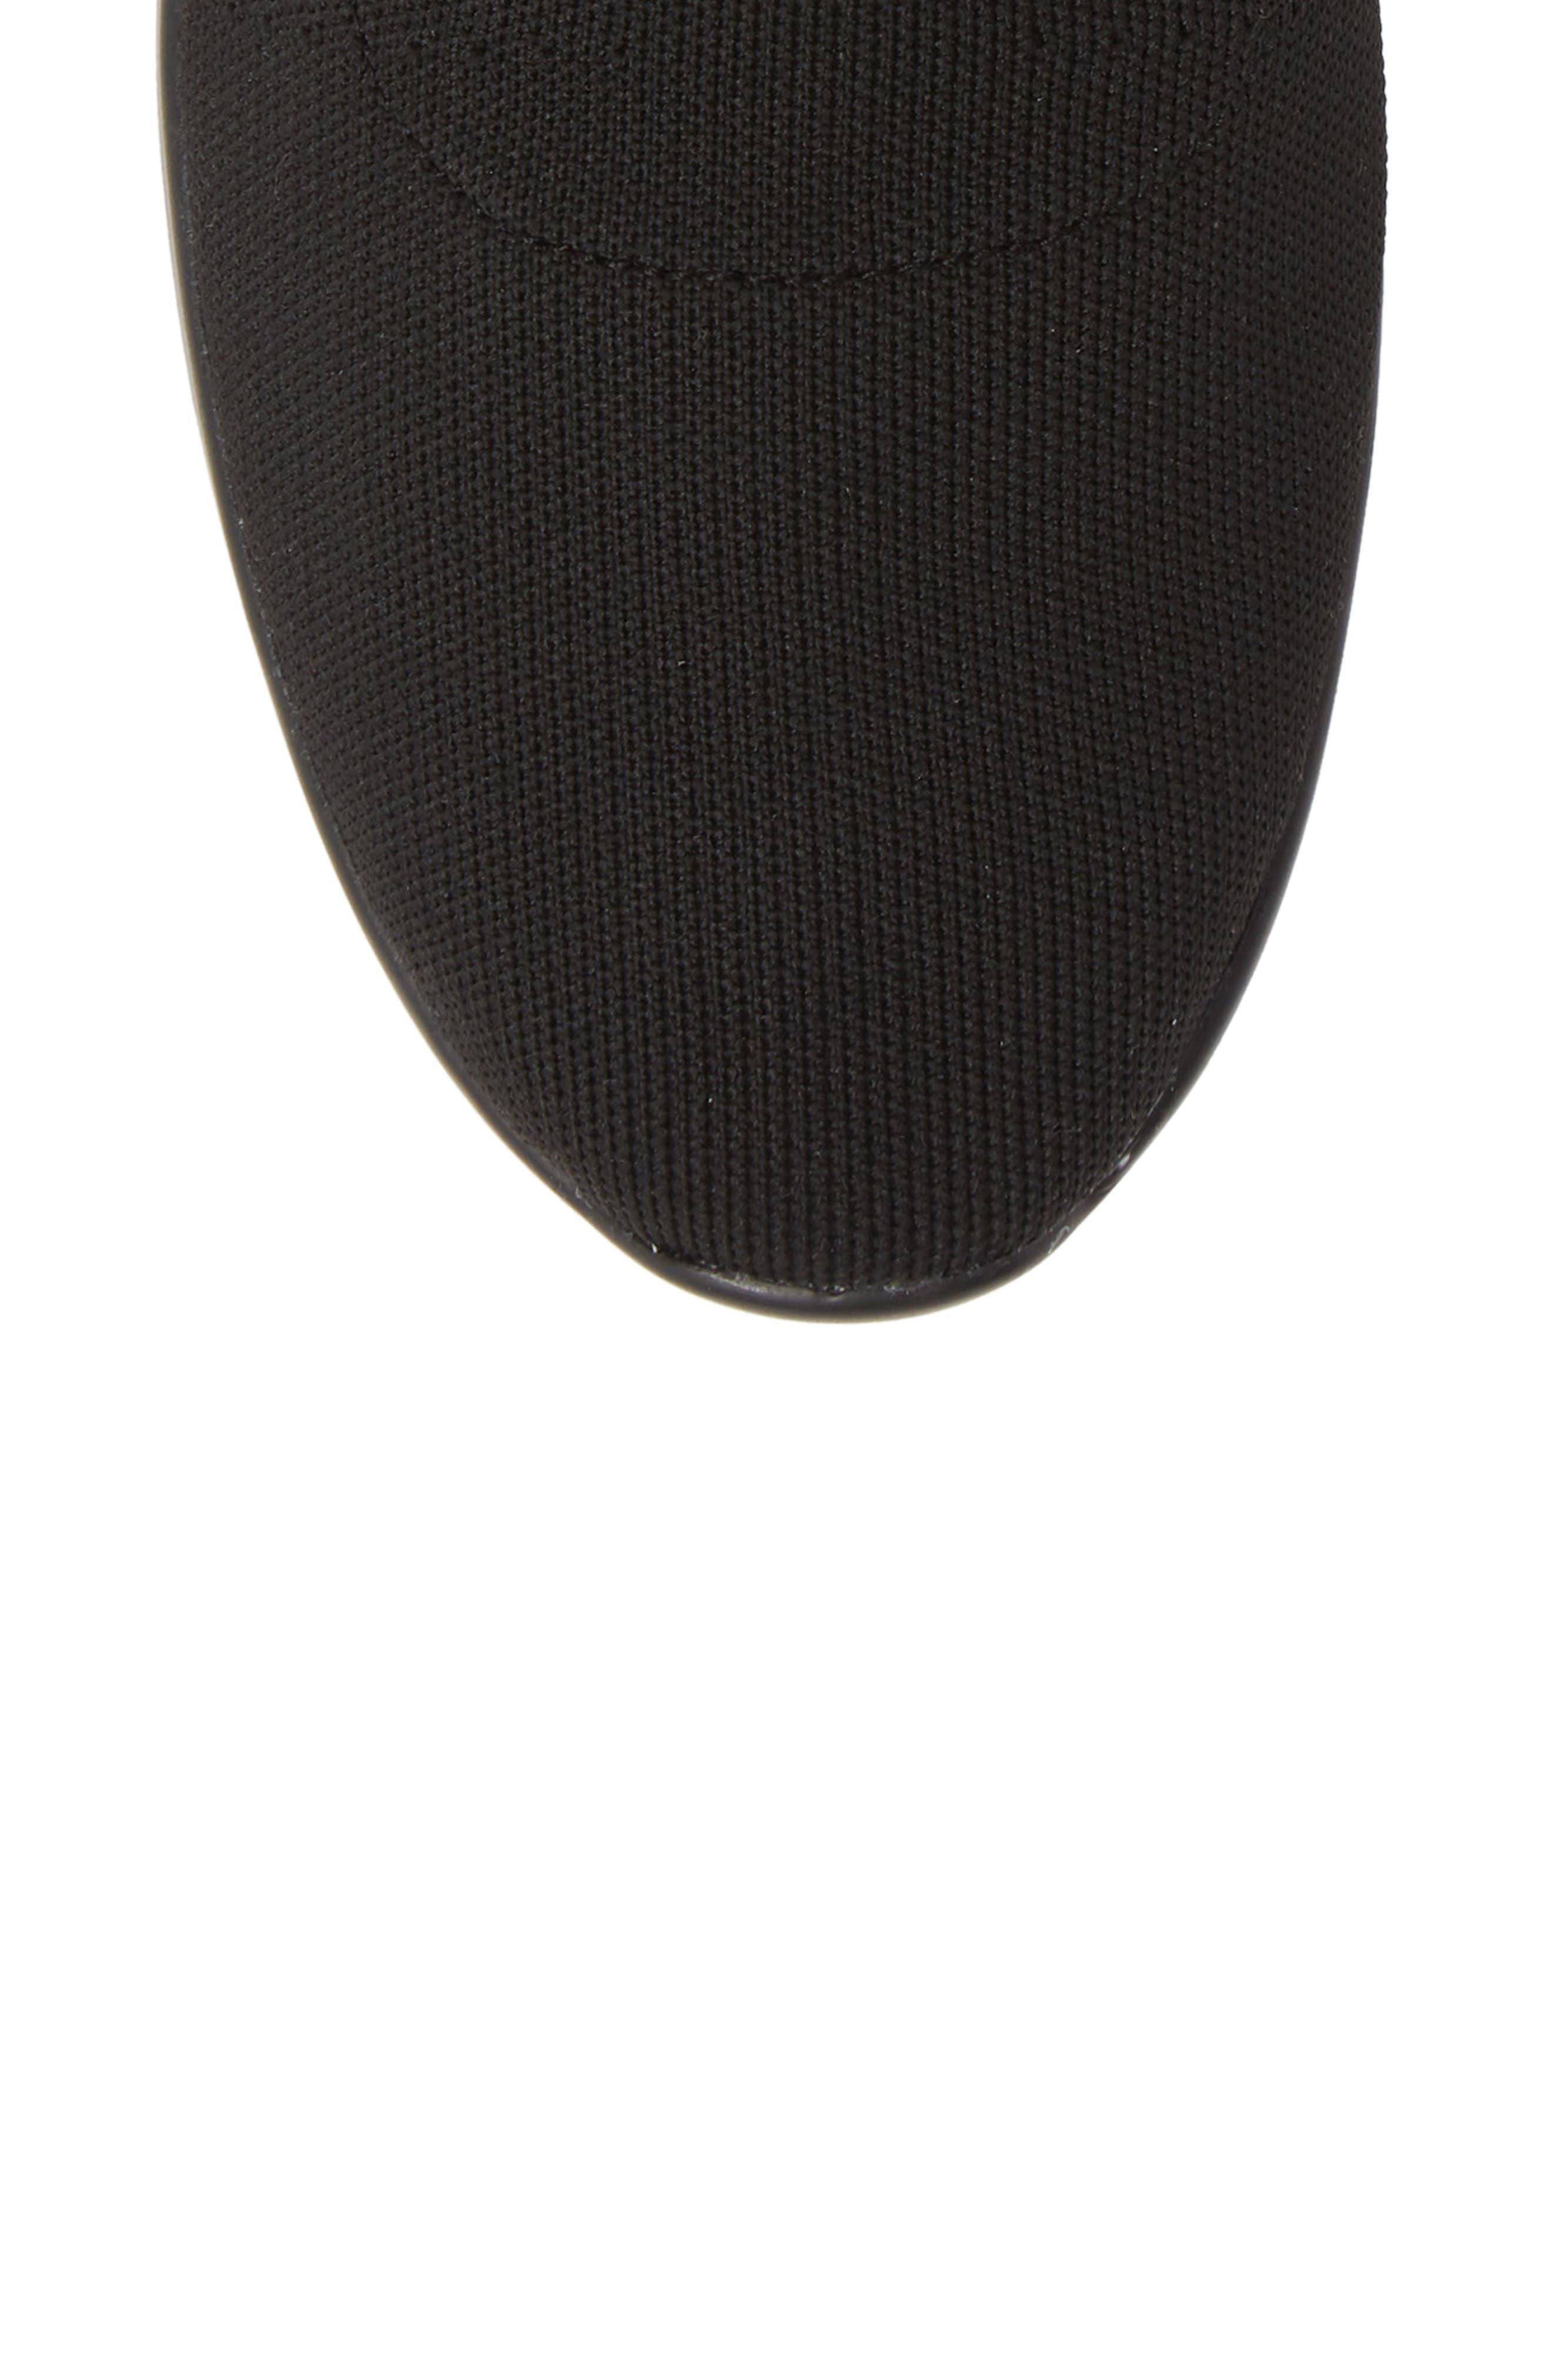 CALVIN KLEIN, Quan Stretch Knit Sneaker, Alternate thumbnail 5, color, BLACK/ WHITE FABRIC